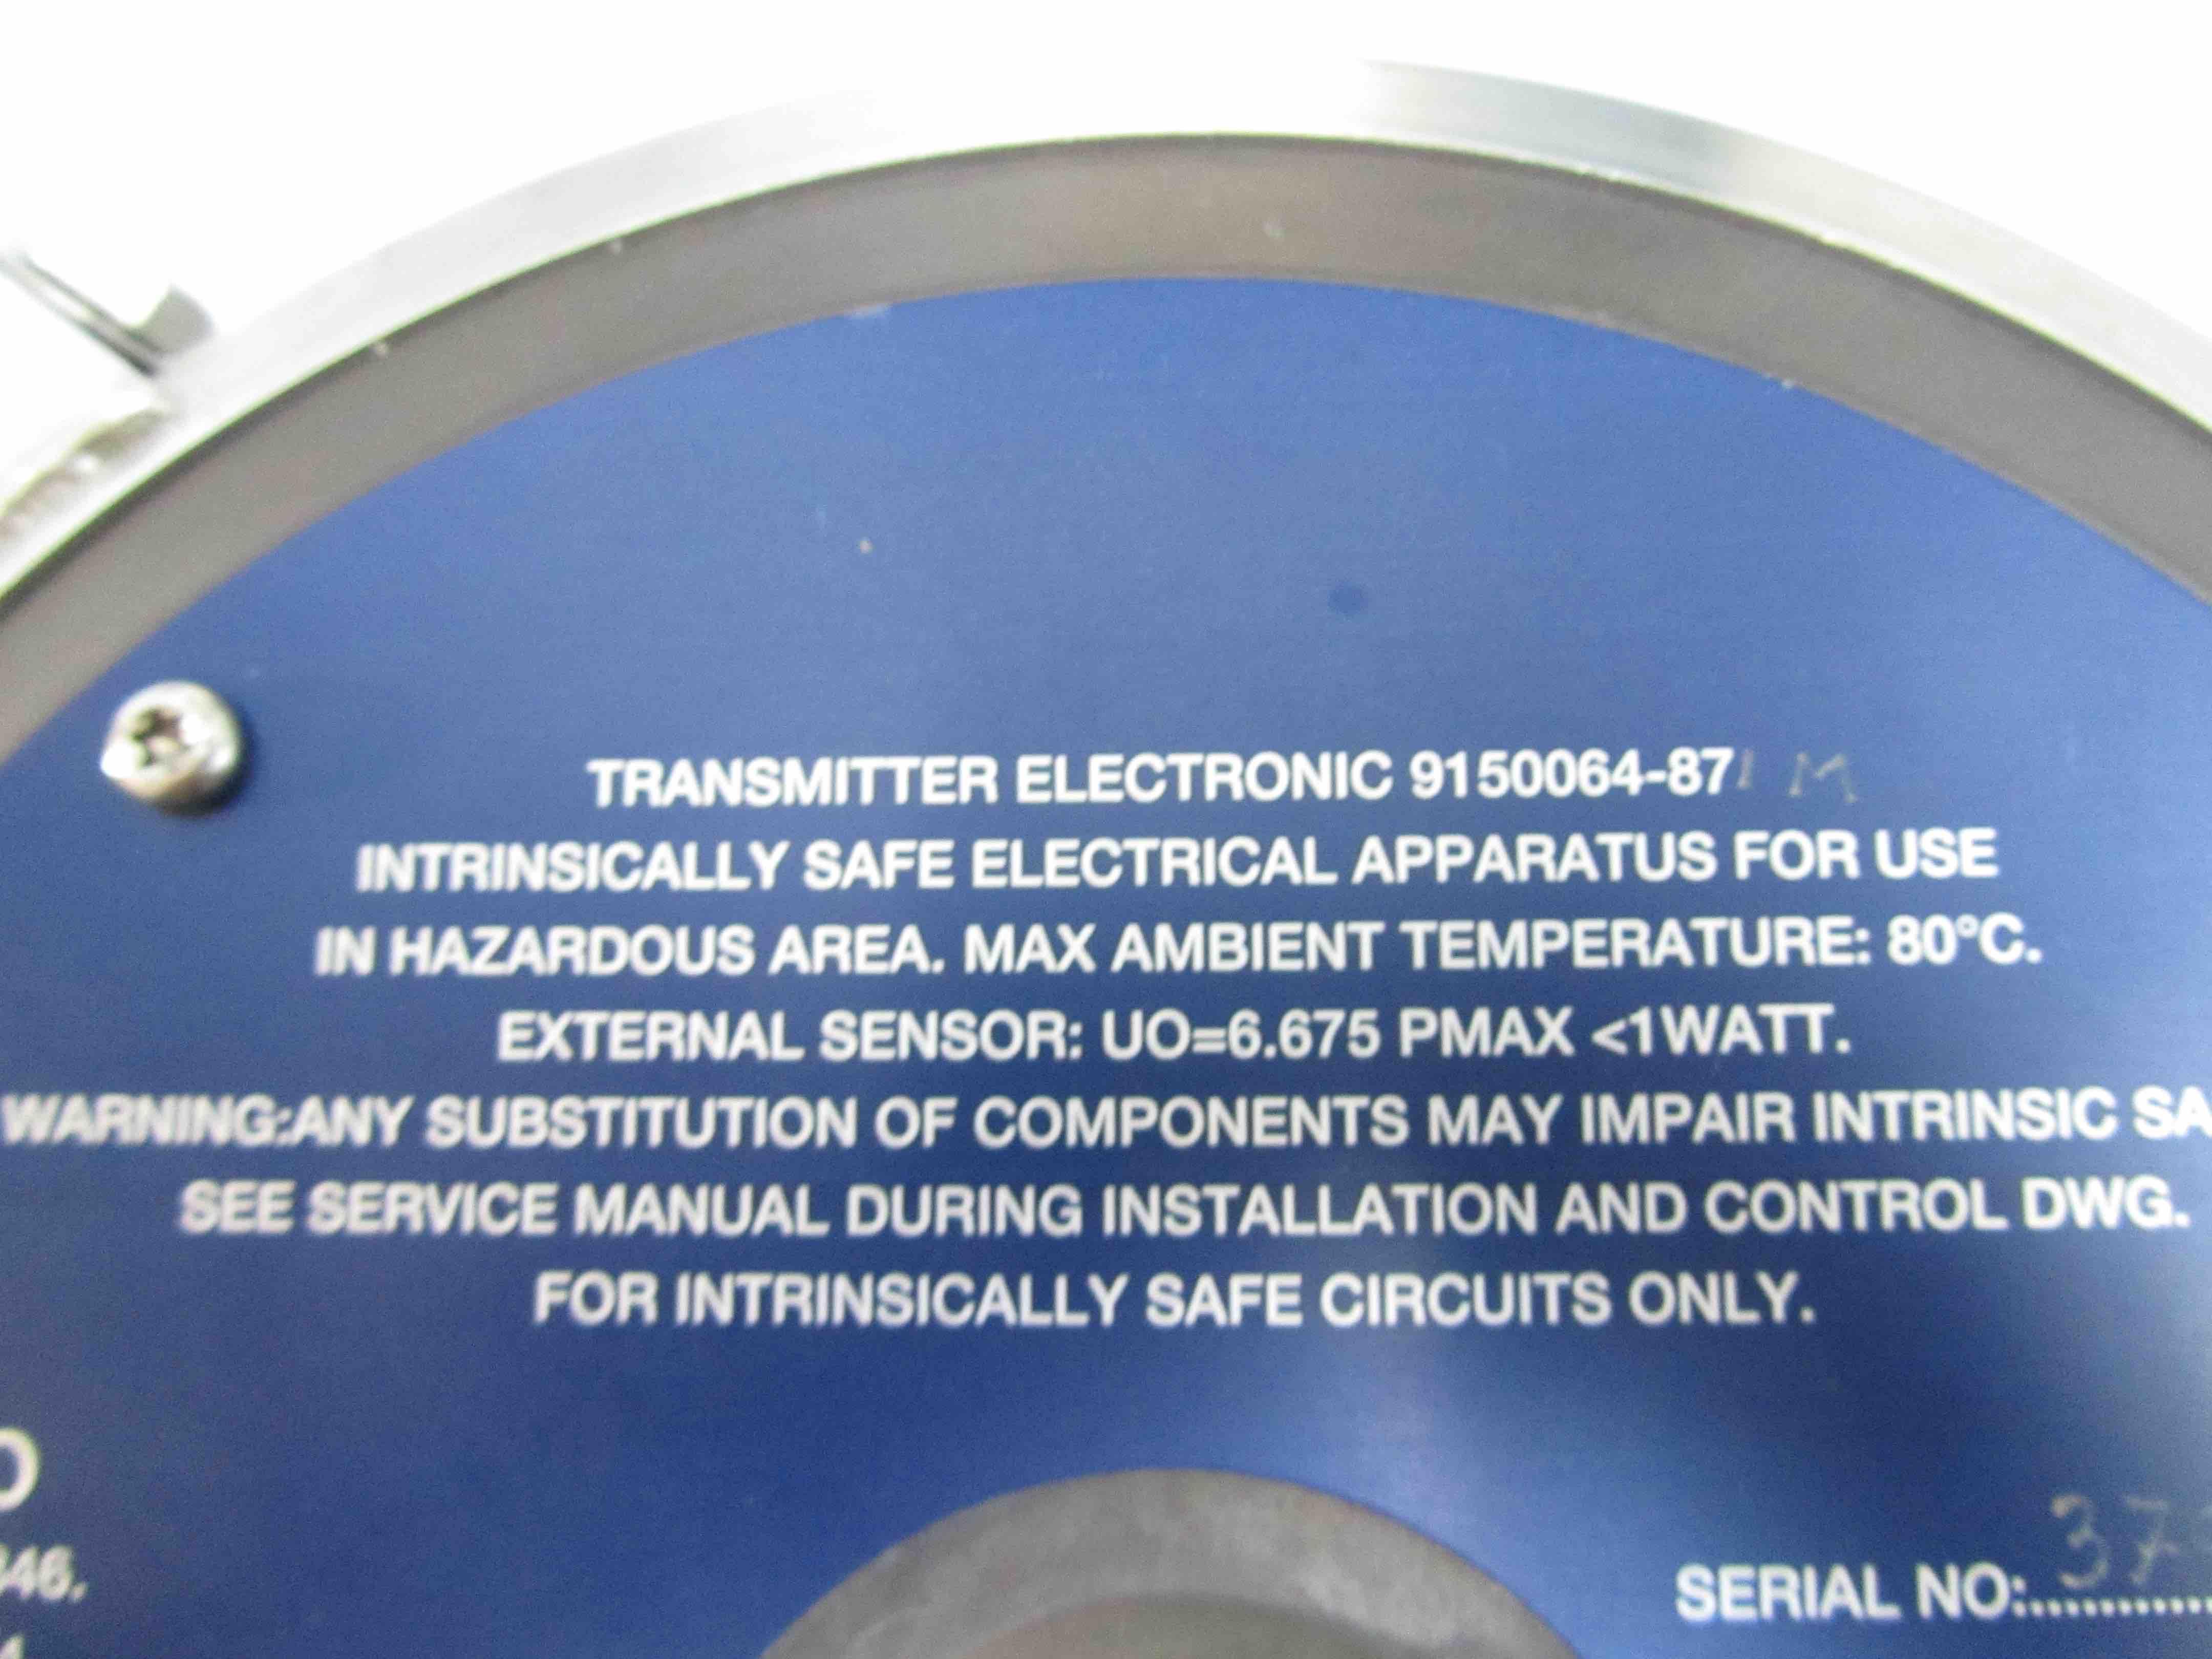 9150064-871 label